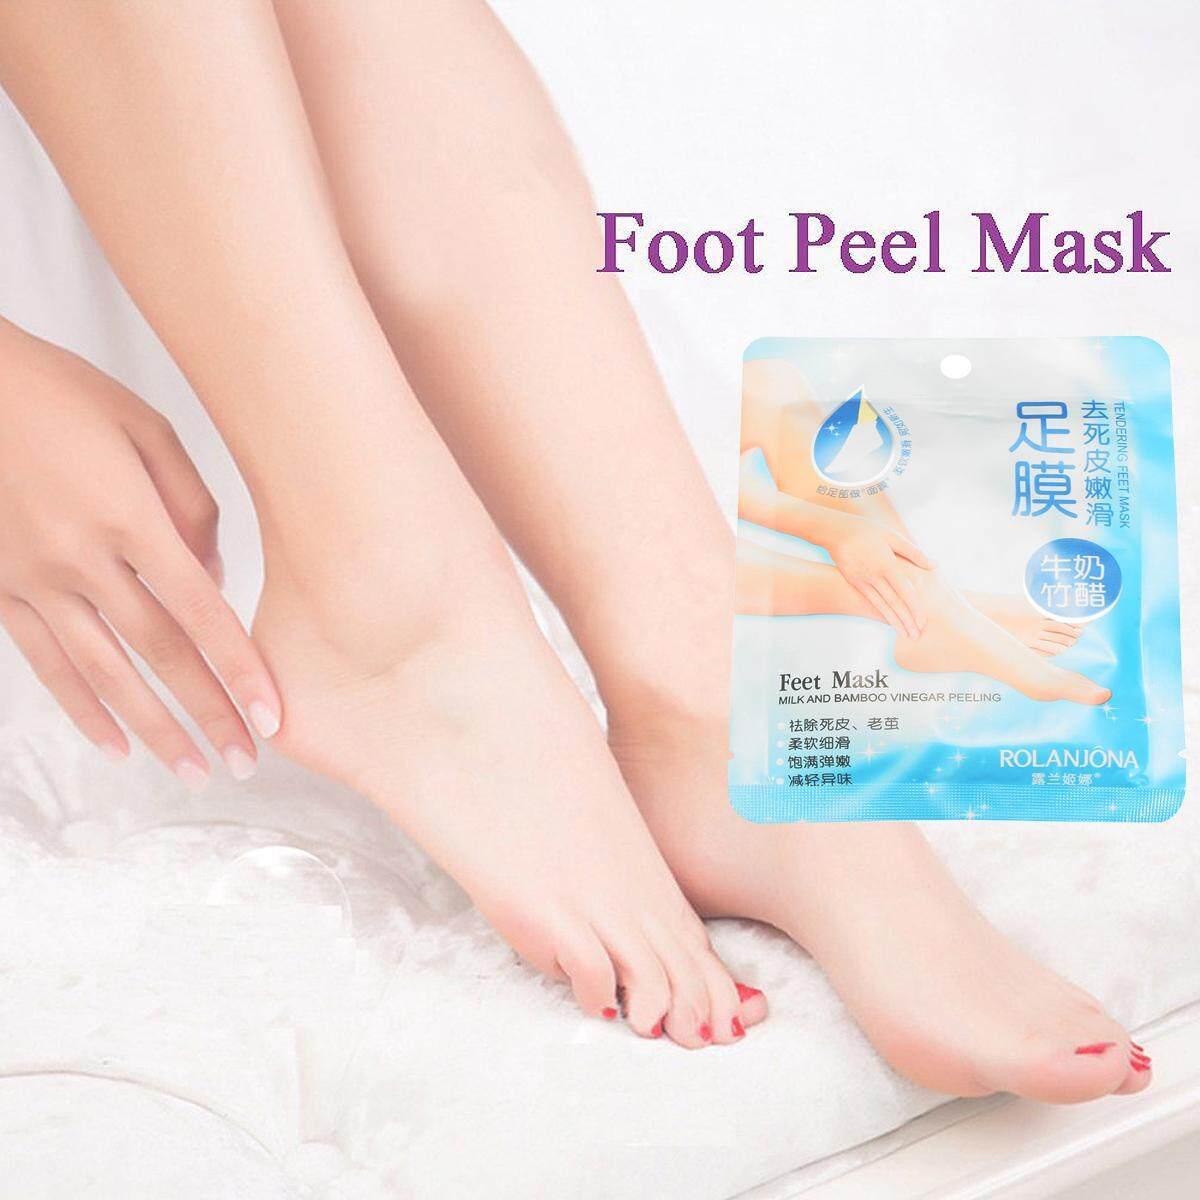 Baby Foot Peeling Mask Masker Kaki Pecah 2 Pcs Daftar Harga Holika Silky One Shot 20017555 Renewal Remove Dead Skin Cuticles Exfoliating Care White Intl